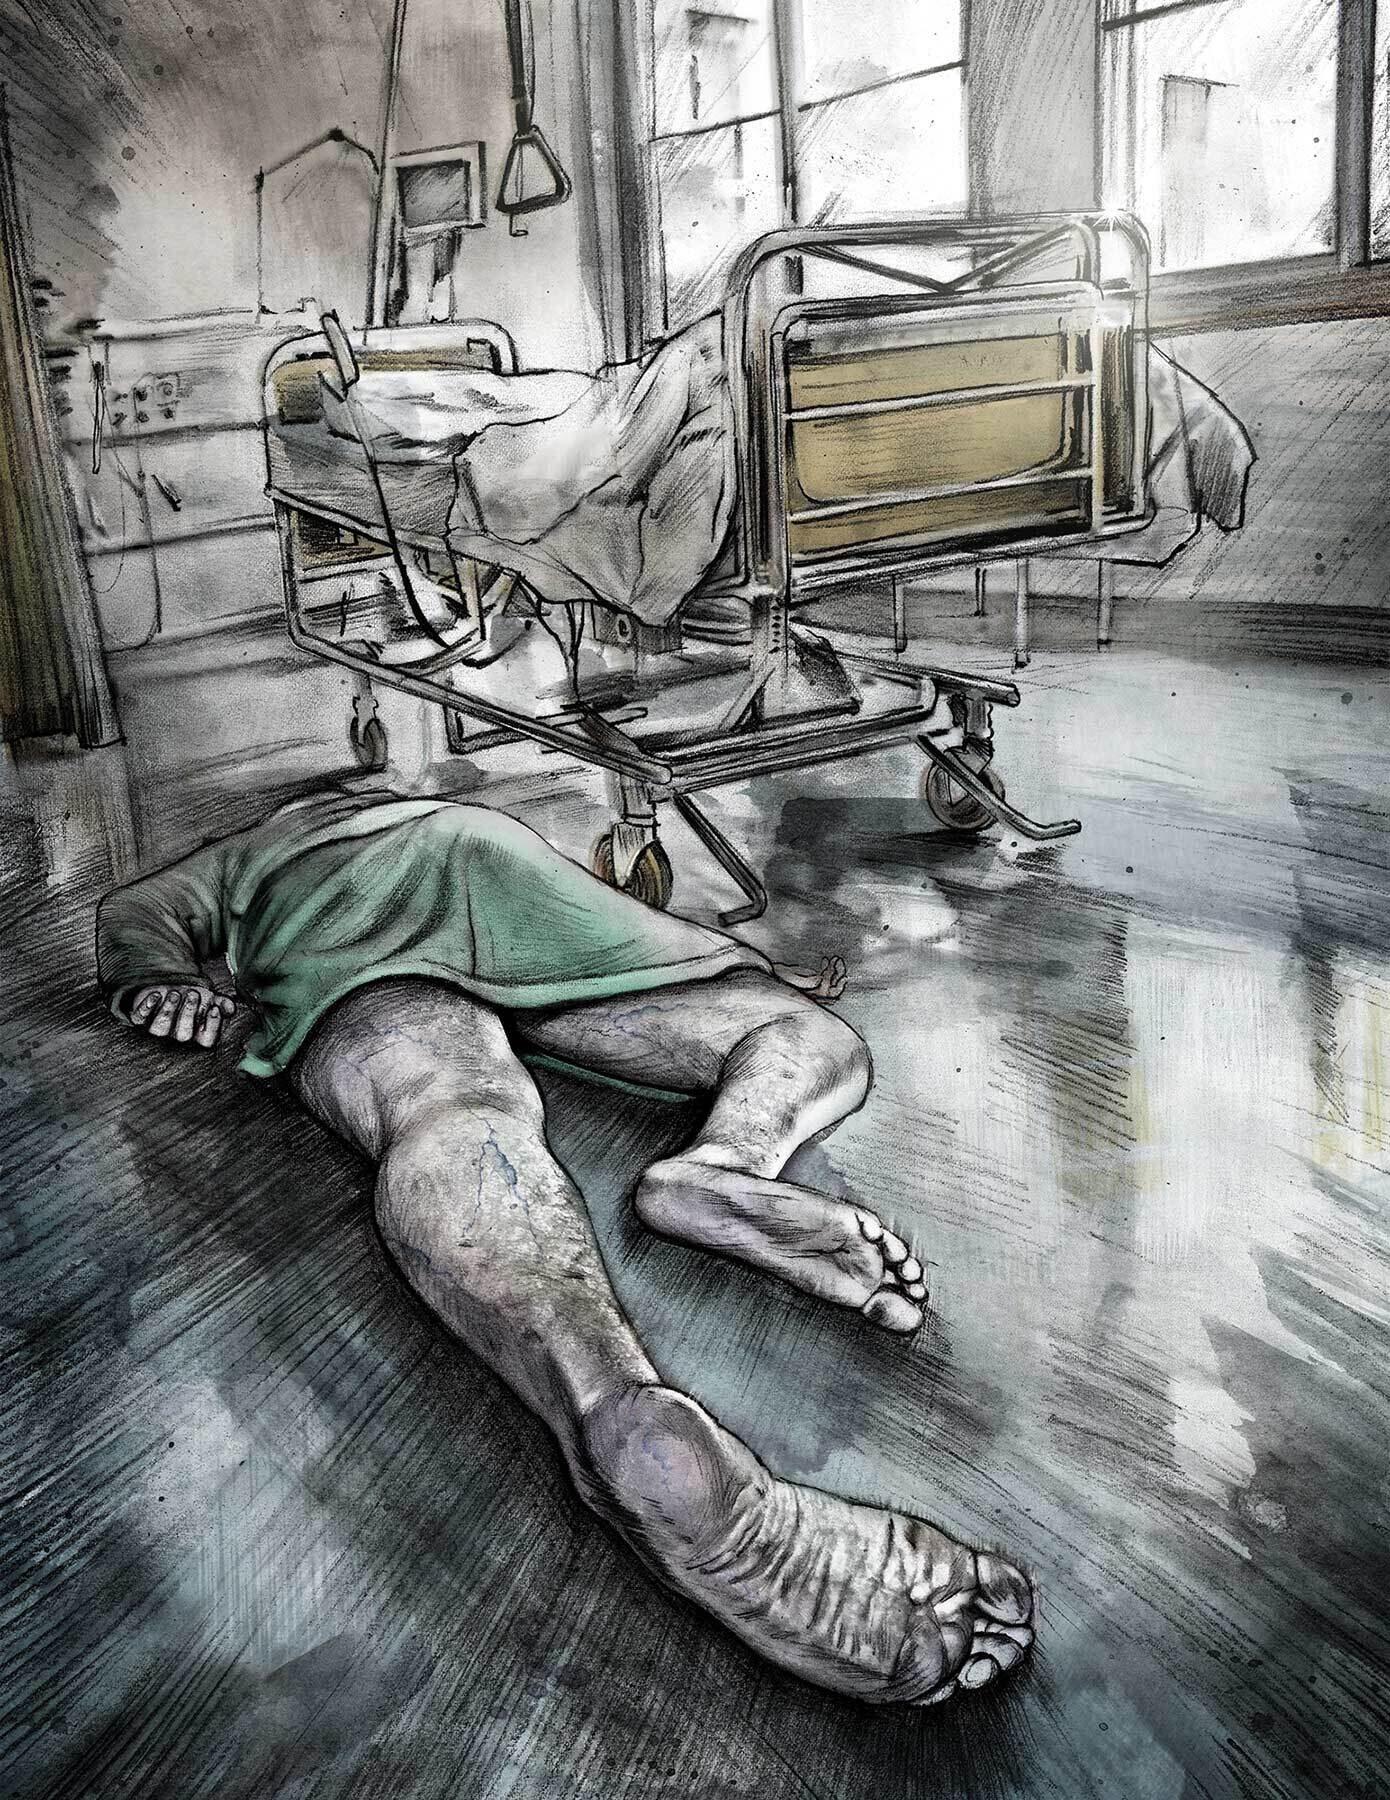 Illustration hospital bed - Kornel Illustration | Kornel Stadler portfolio